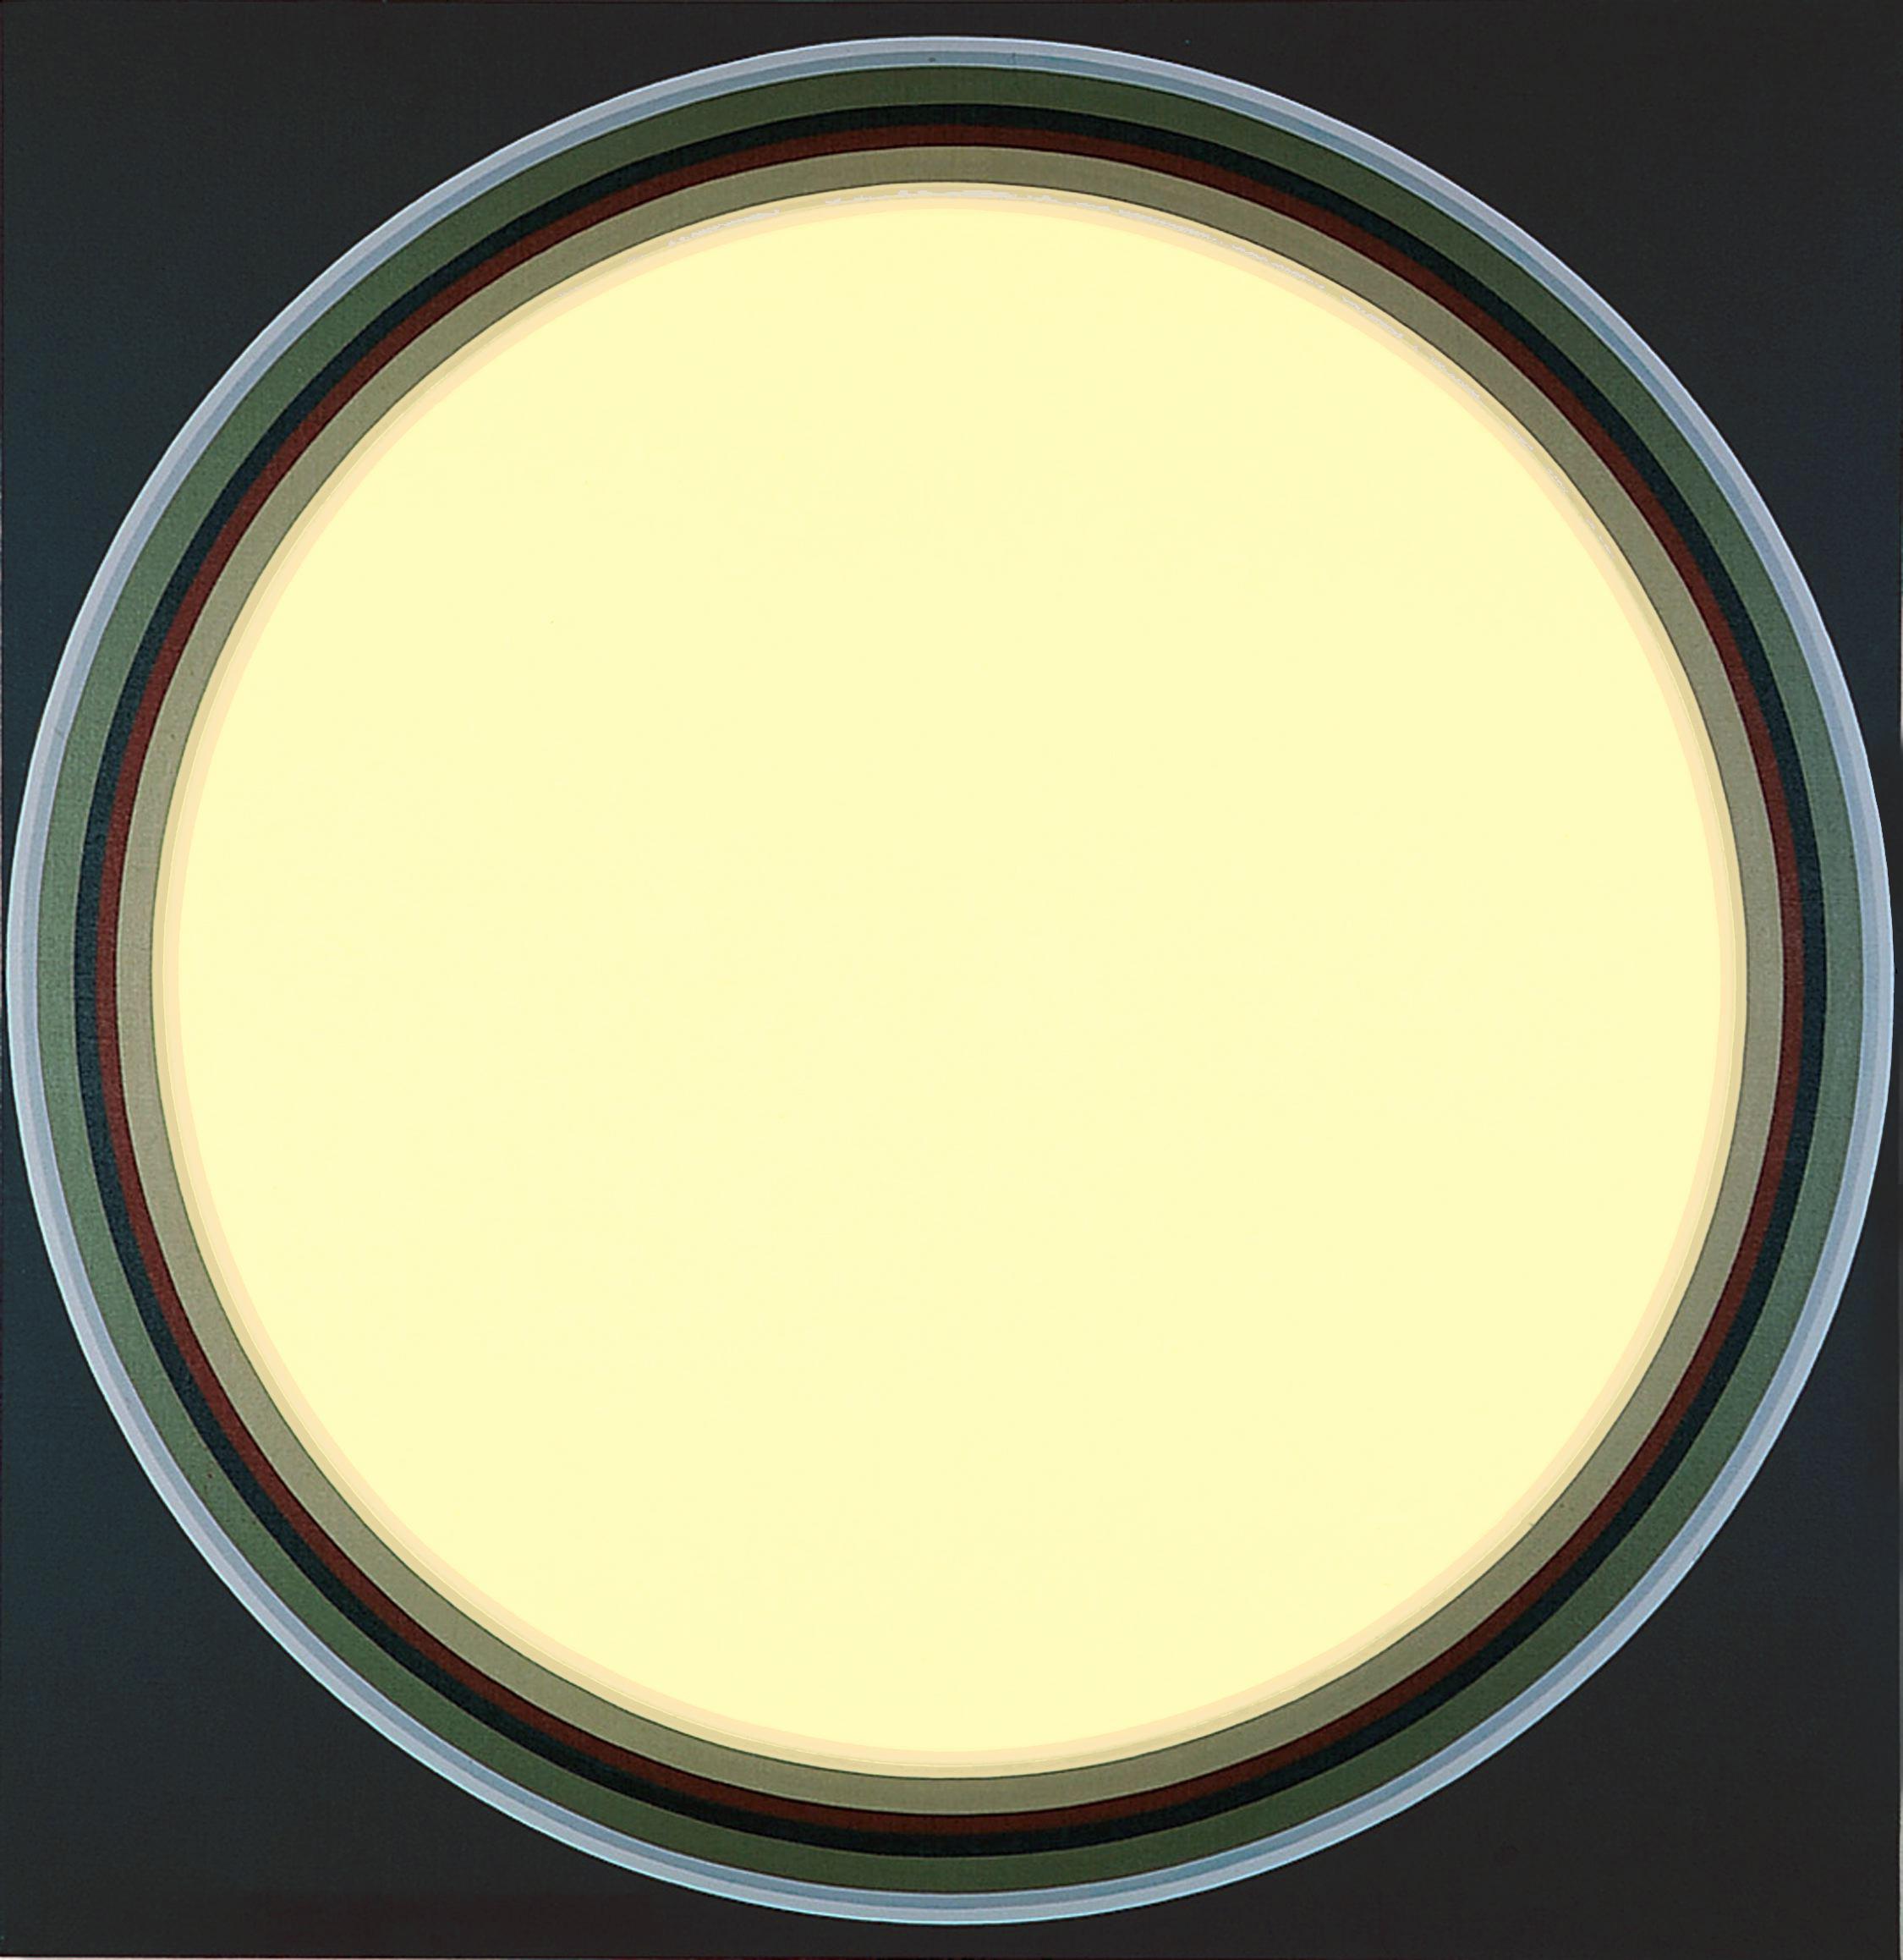 John Stephan: Disk #10, 1971, acrylic on linen, 70 x 68 inches